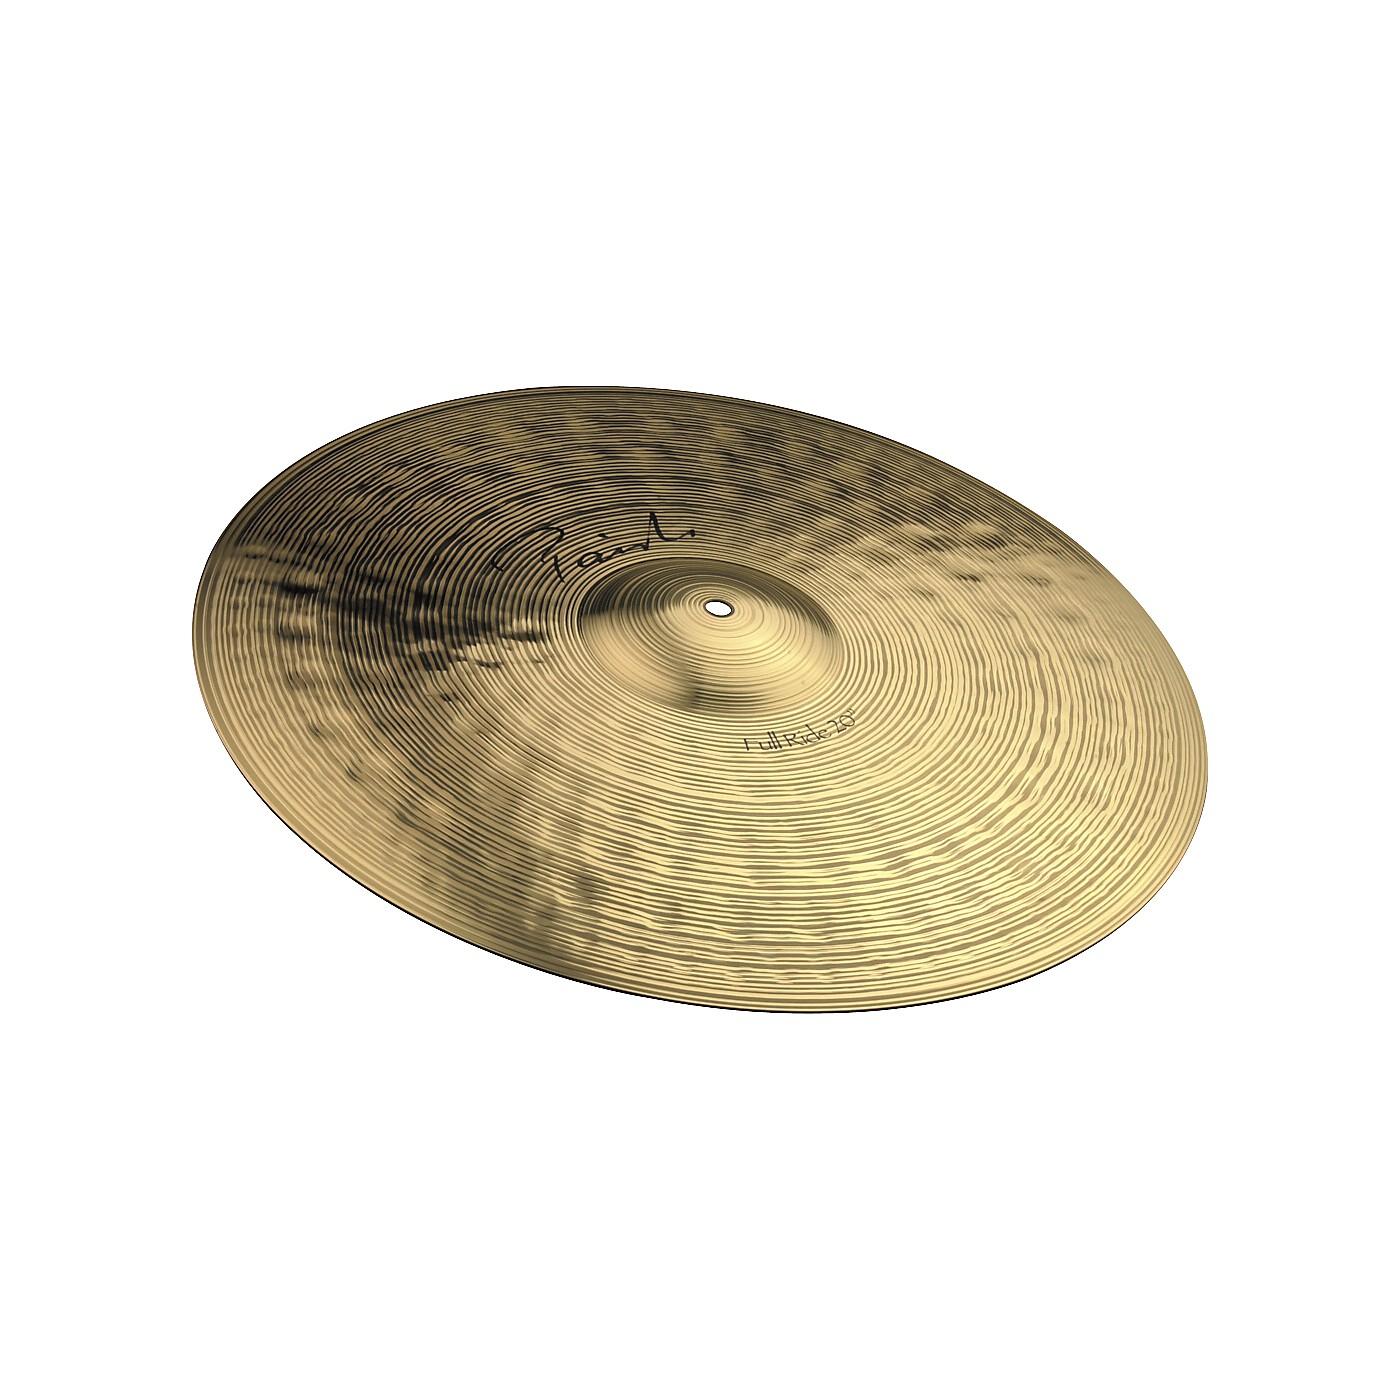 Paiste Signature Full Ride Cymbal thumbnail